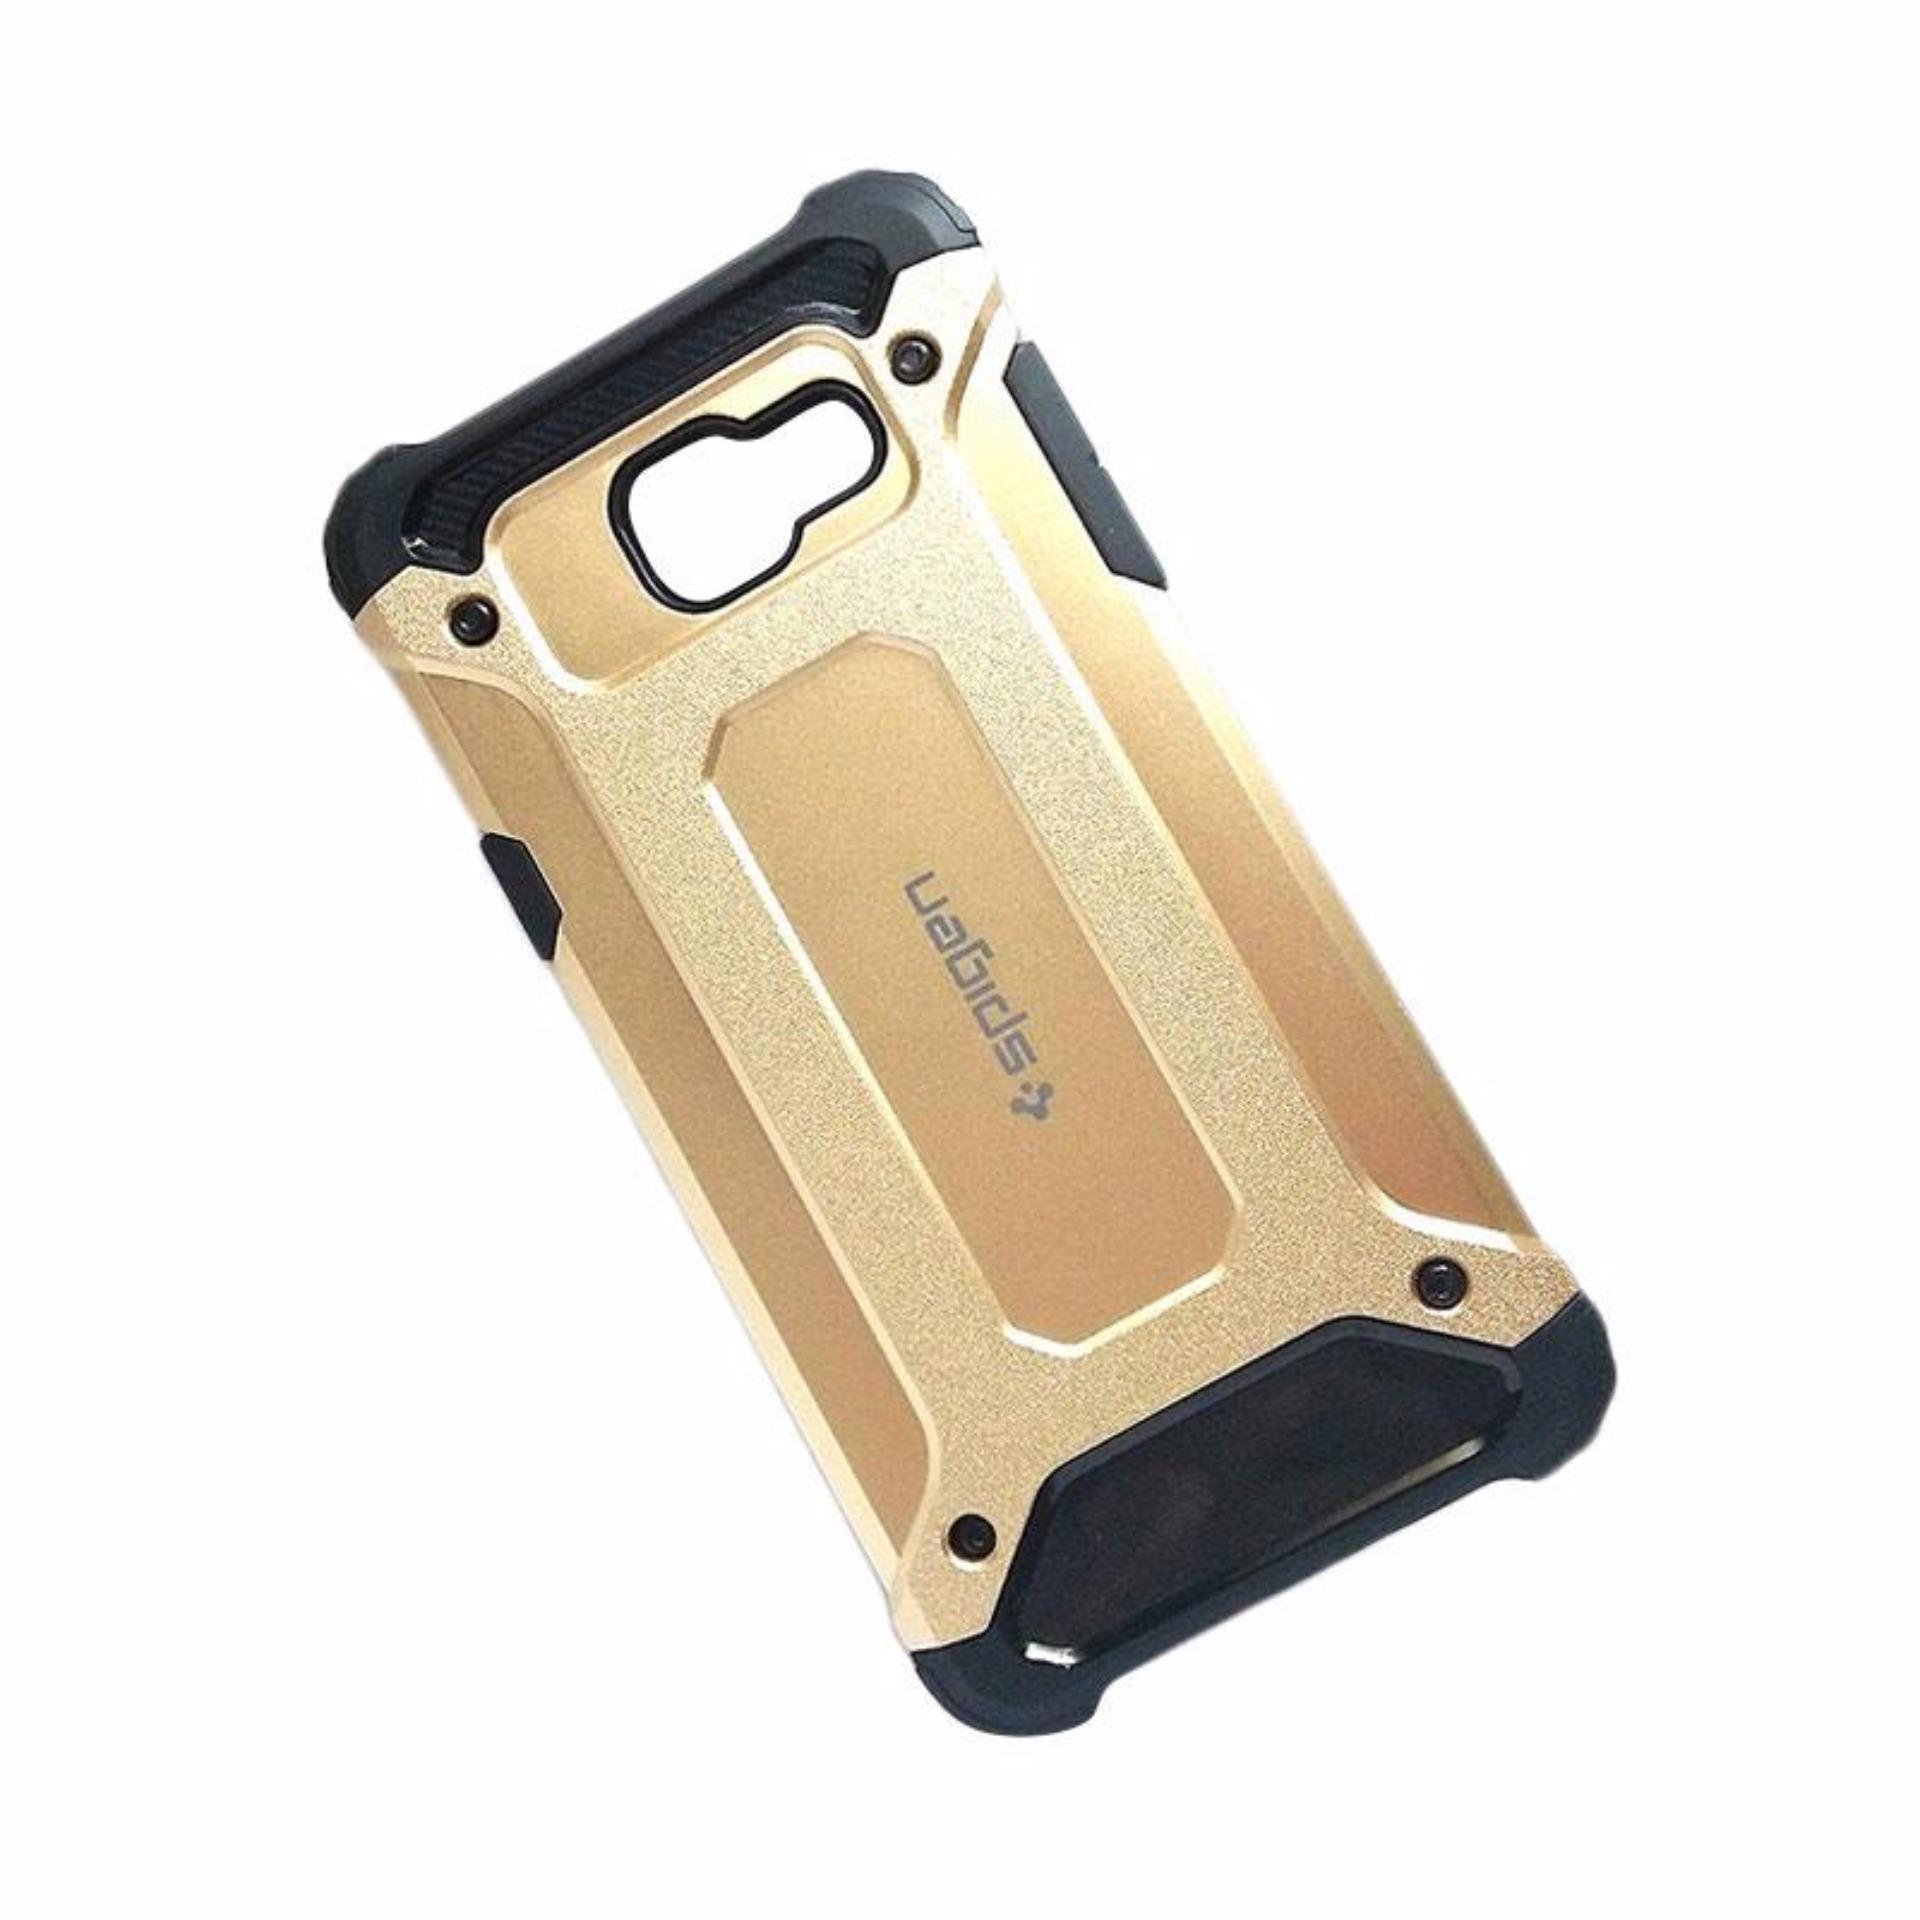 Casing Handphone Spigen Transformers Iron Robot Hardcase Casing For Samsung Galaxy J7 Prime